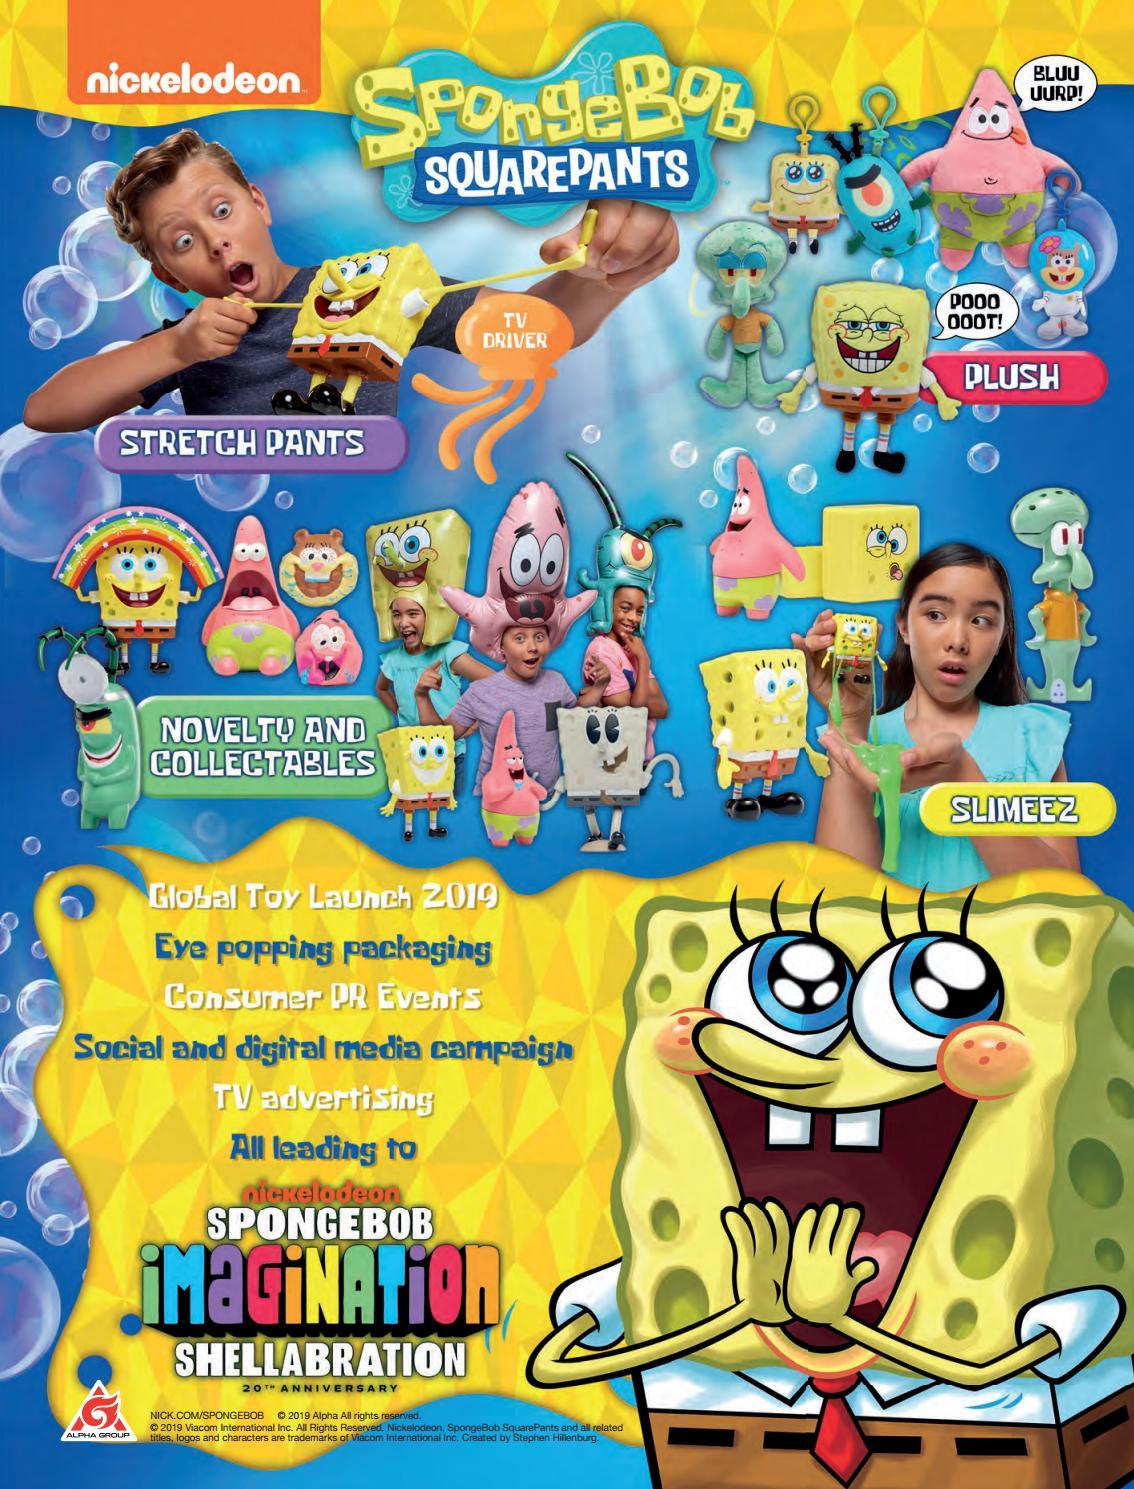 NickALive!: Nickelodeon Outlines SpongeBob SquarePants' 20th